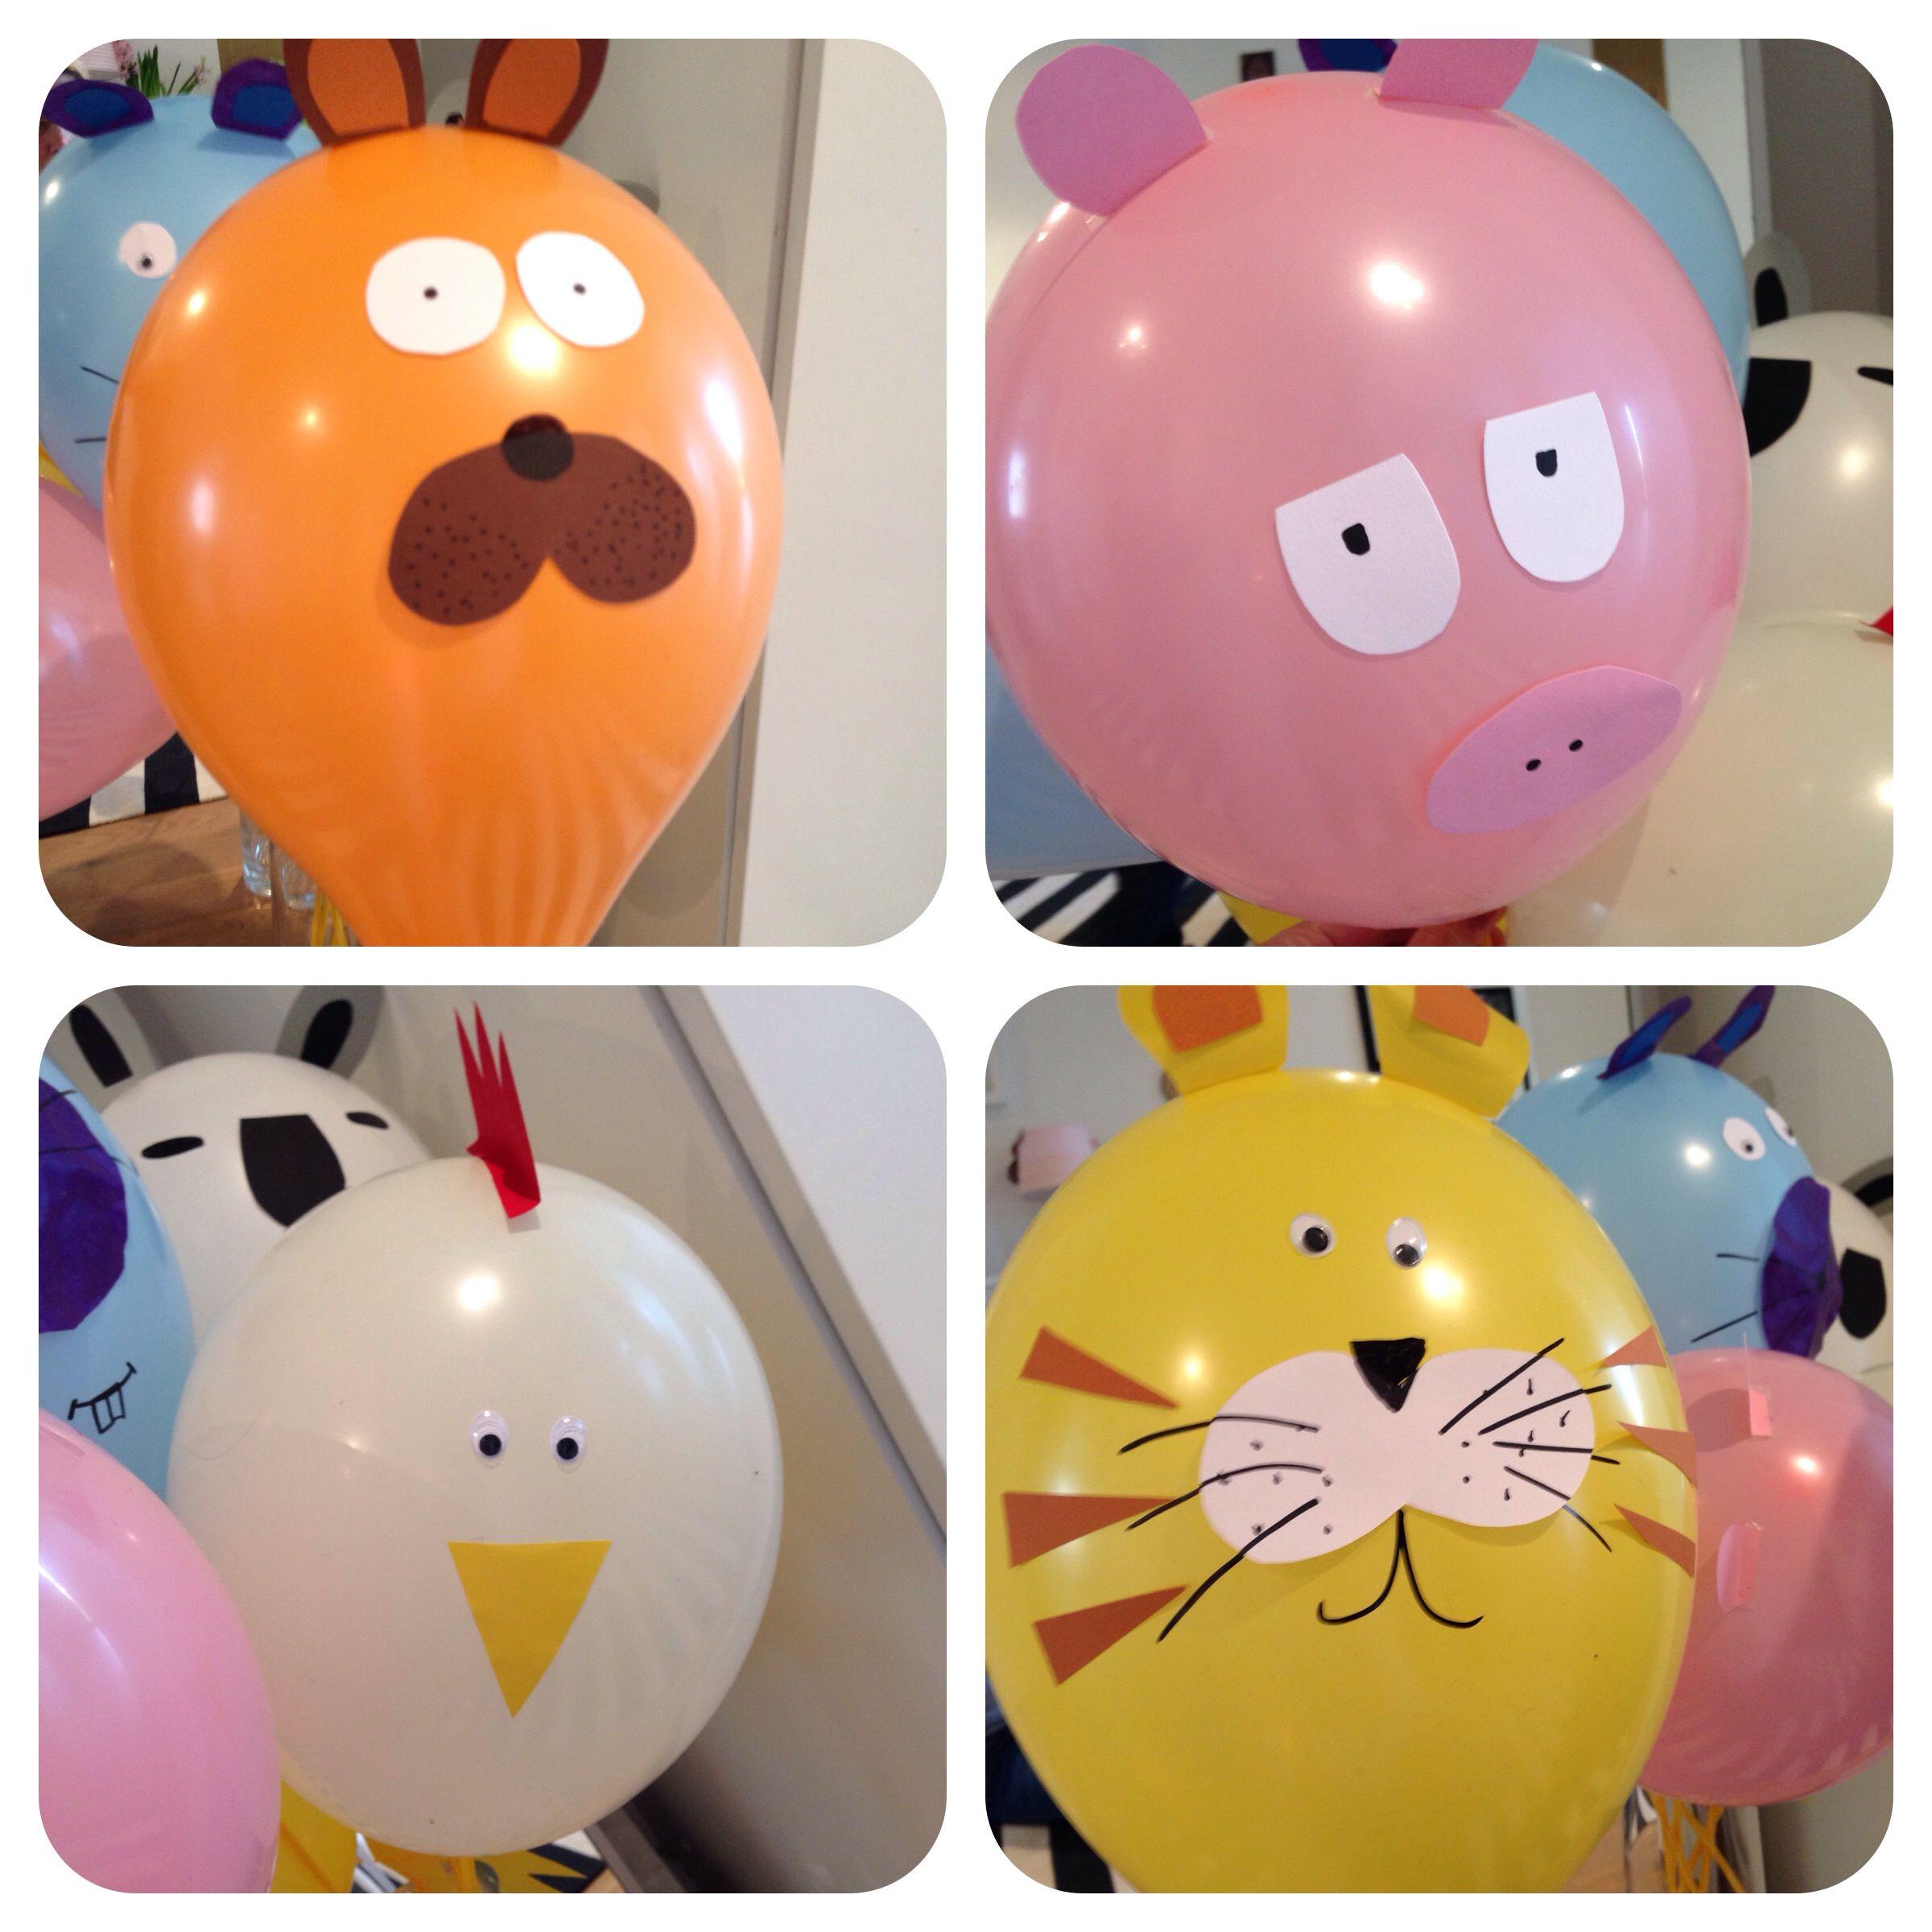 Balloon Animals Party Fun For Toddlers Ballon Tiere Für